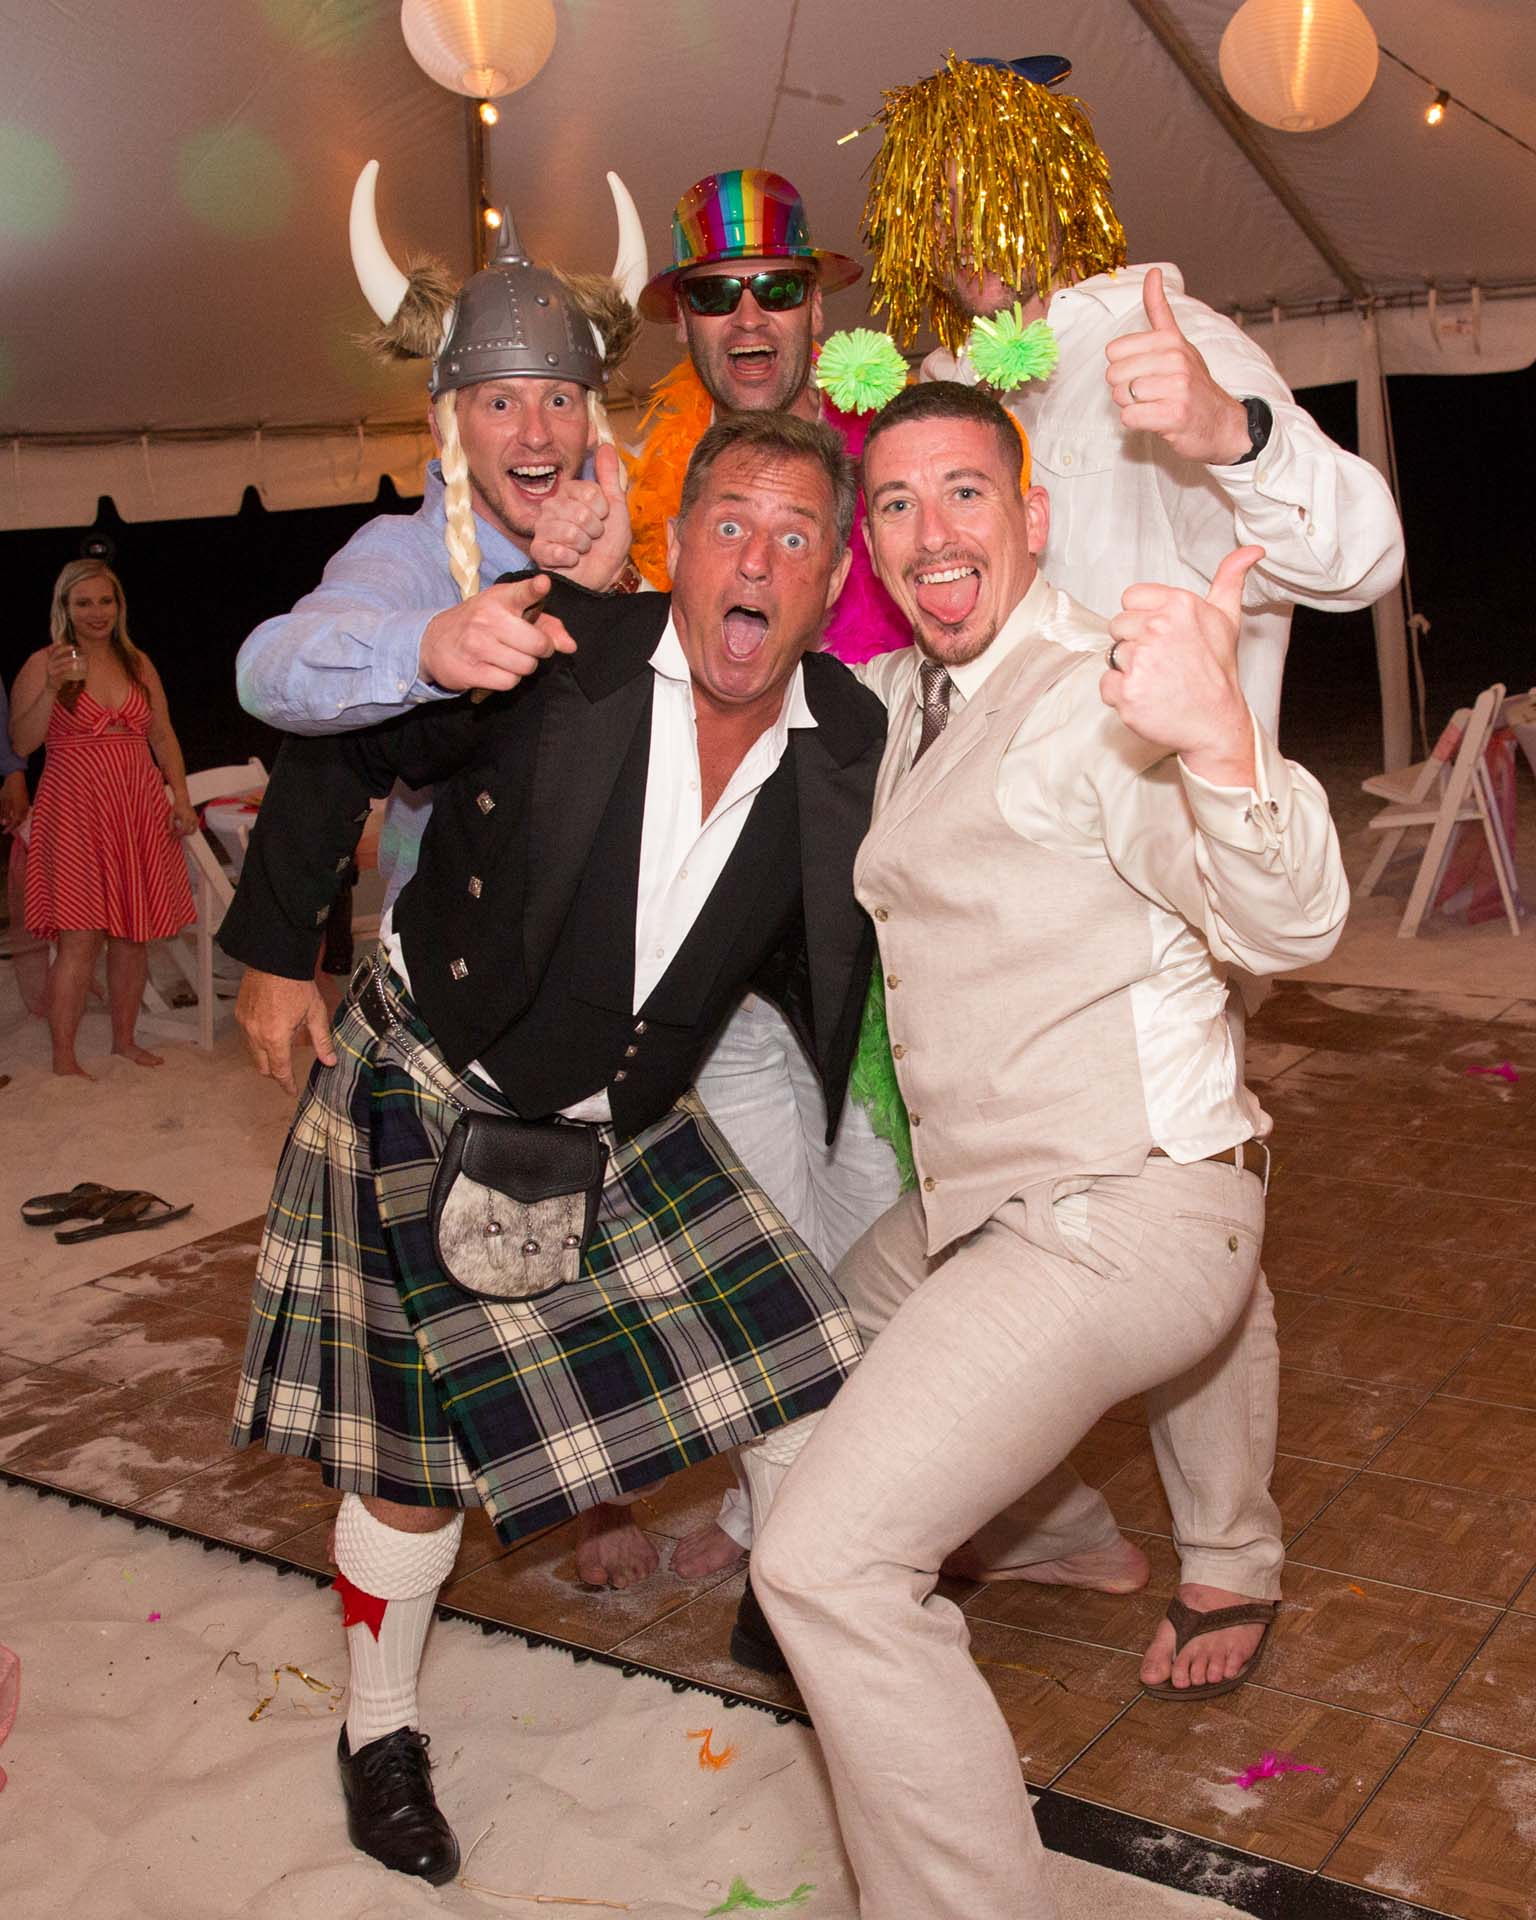 Wedding party at reception